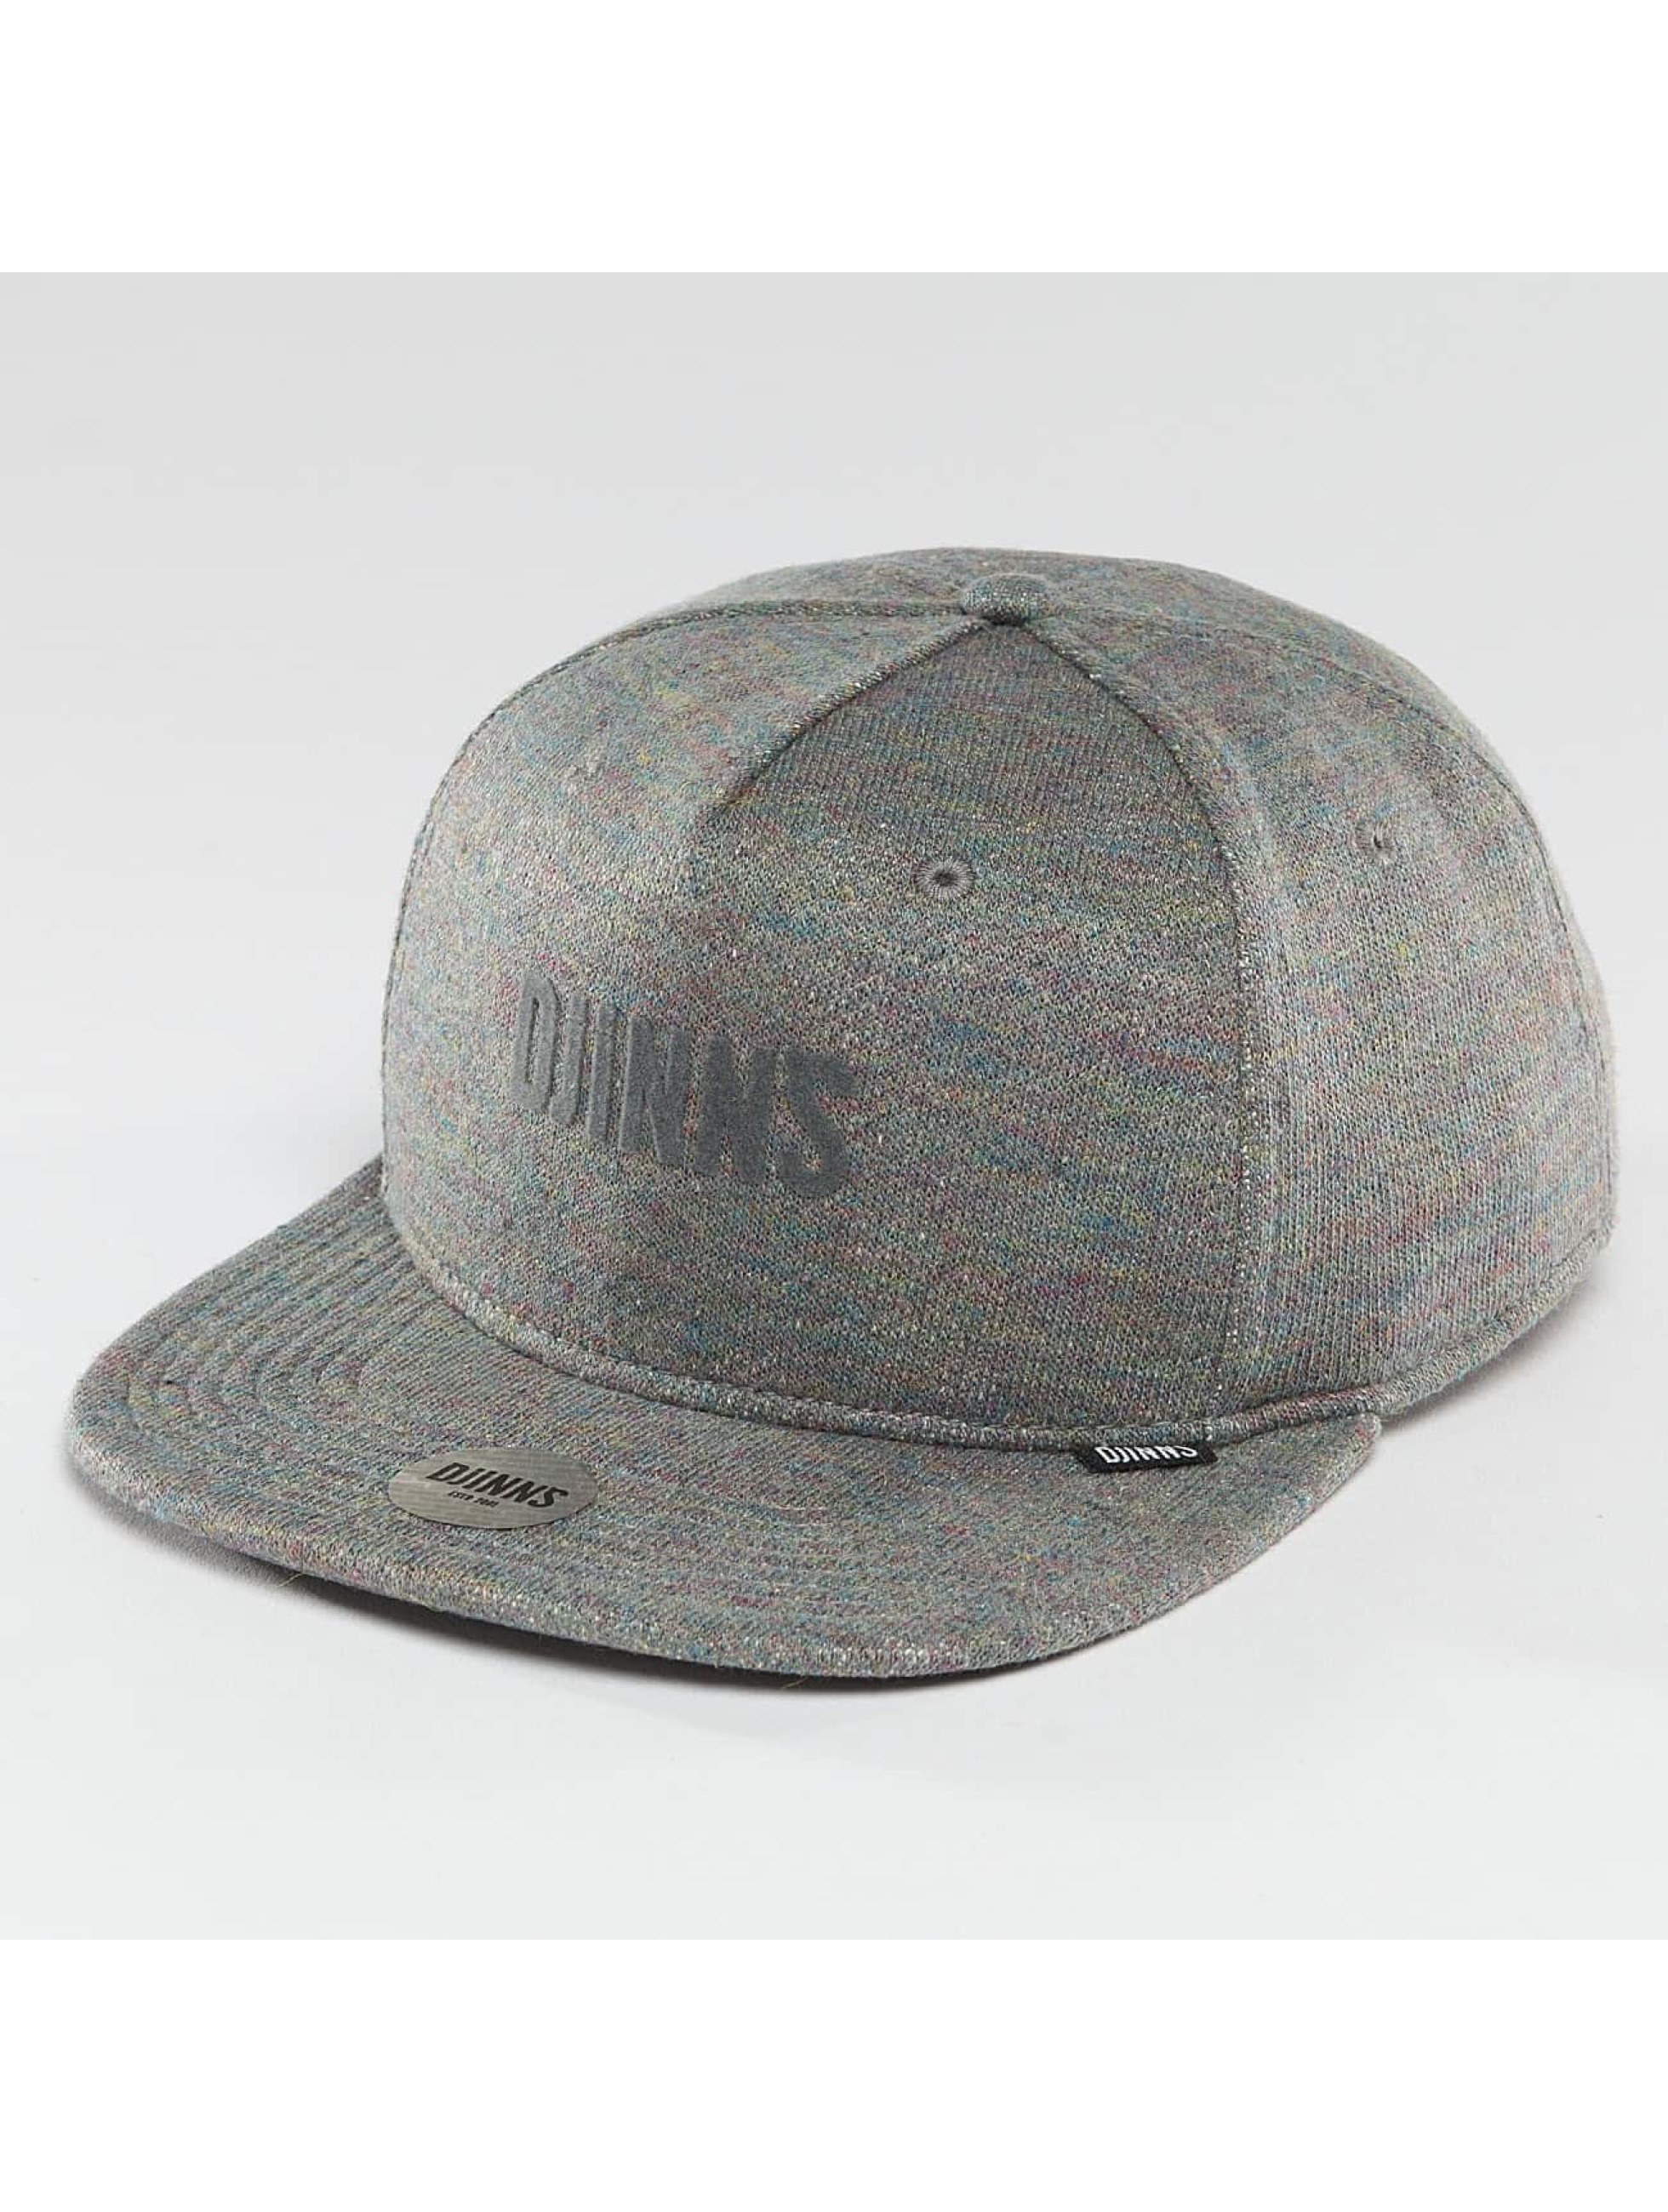 Djinns Männer,Frauen Snapback Cap Multi Melange in grau